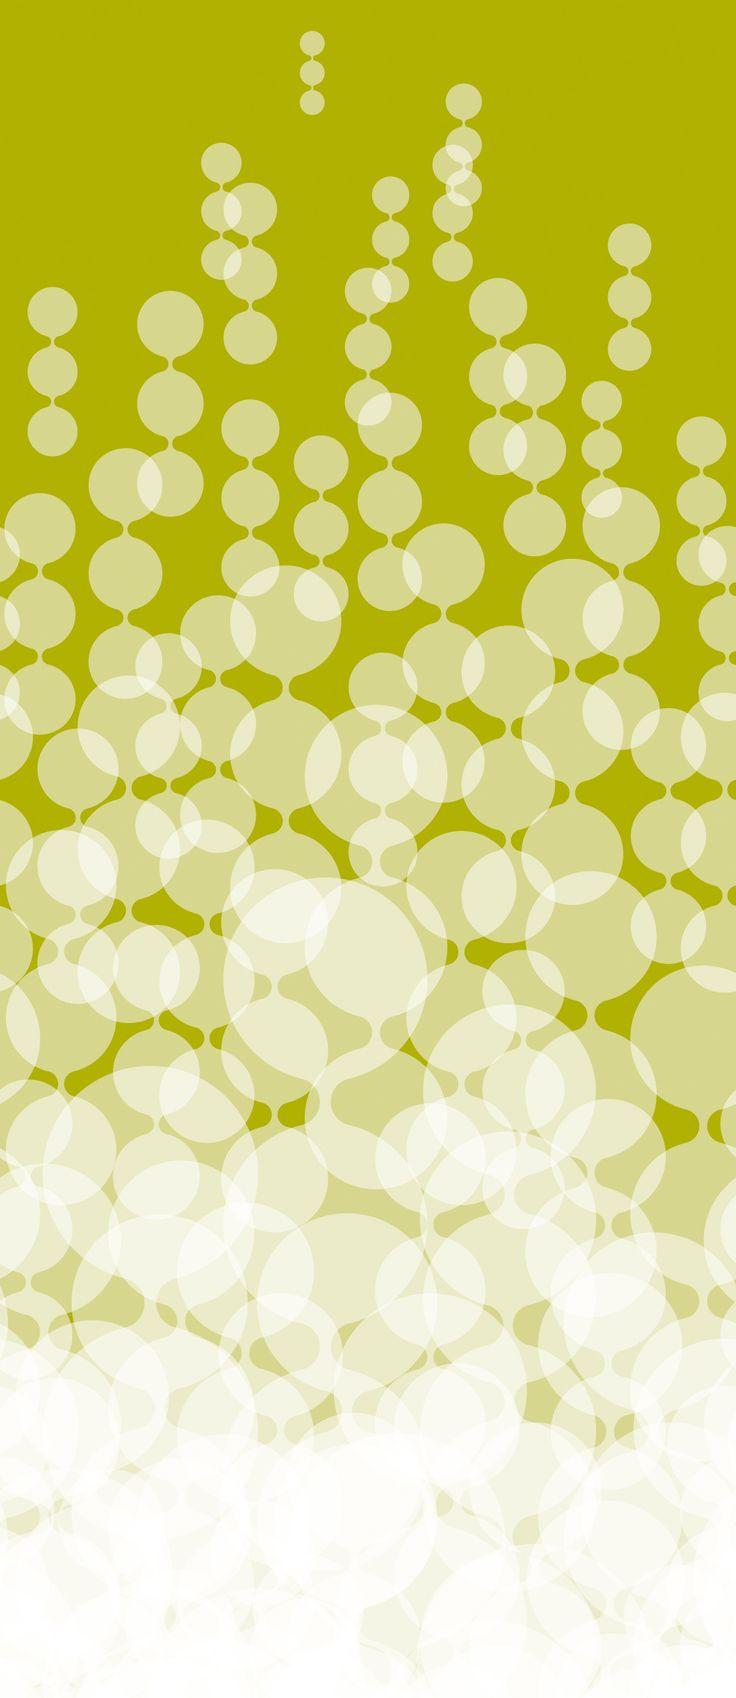 RESOPAL® - Kreativität ausleben, Ideen realisieren, Wohlfühlräume schaffen: Kollektionen - Künstlerkollektionen >> Contzen´tration 2 by Lars Contzen >> Beautiful Balloons - Olive neg.